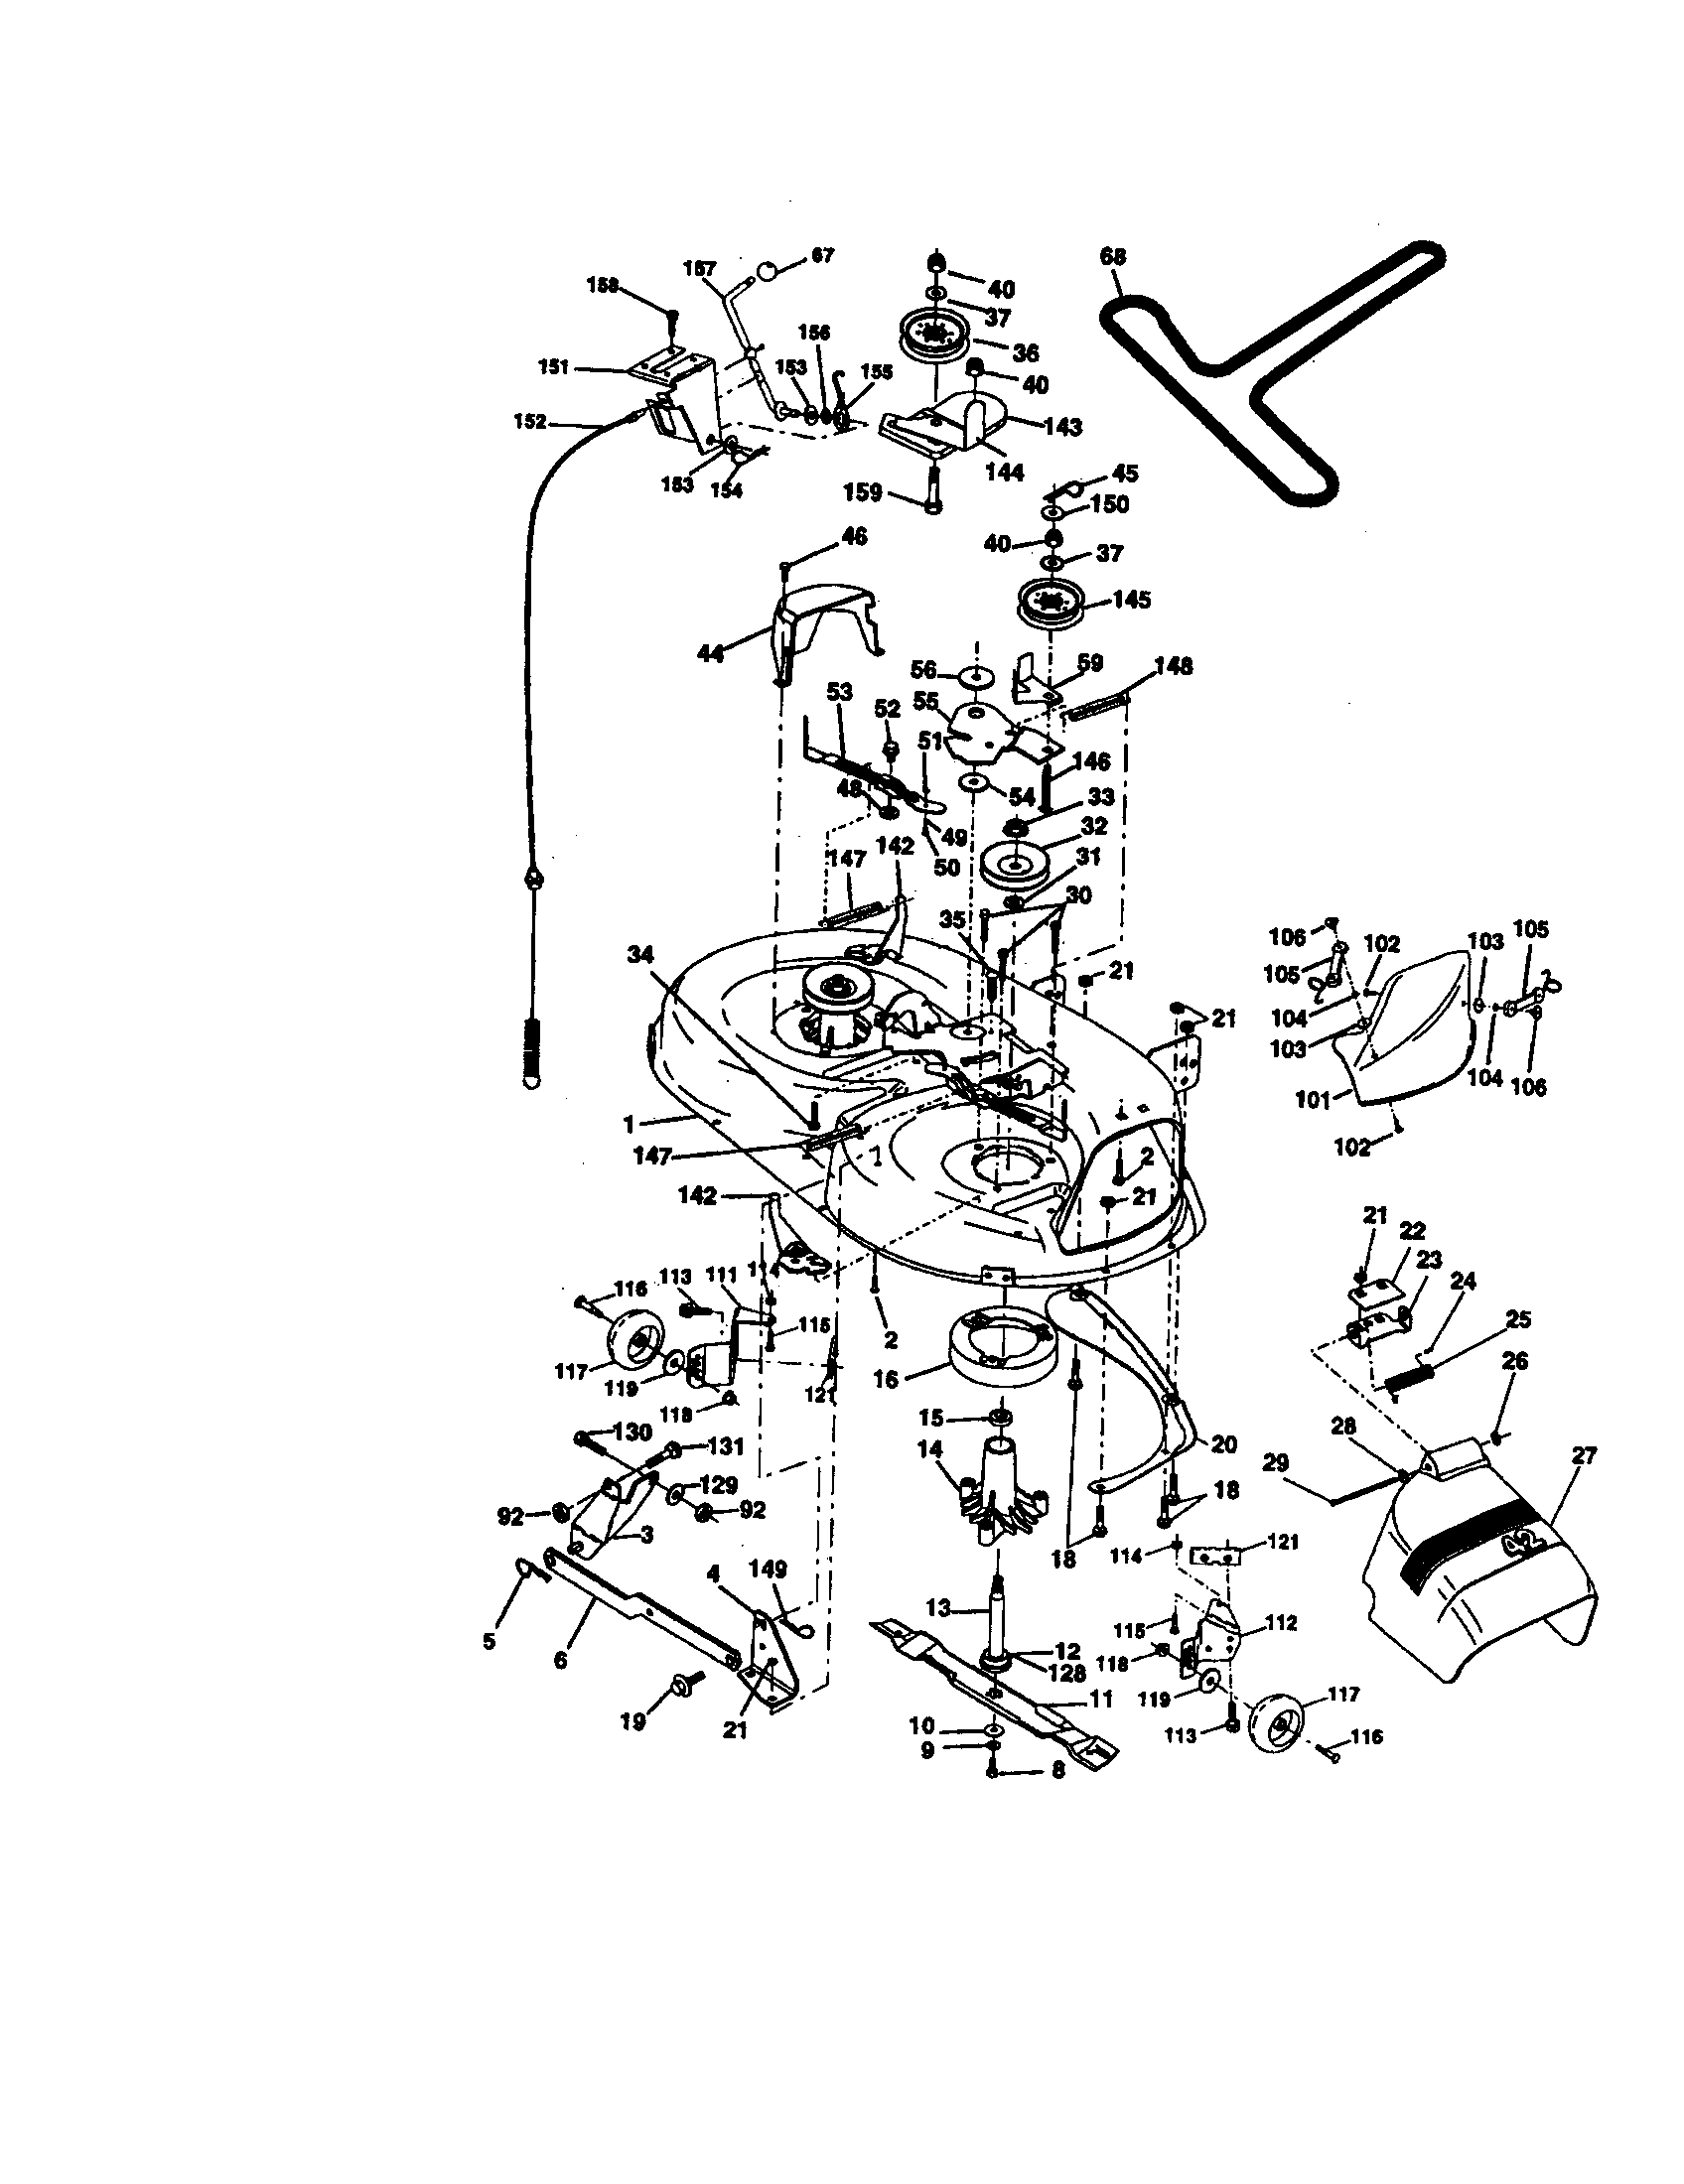 3y83a Wiring Diagram Craftsman Riding Lawn Mower Need One Sears Suburban 12 1 4 Hp Murray